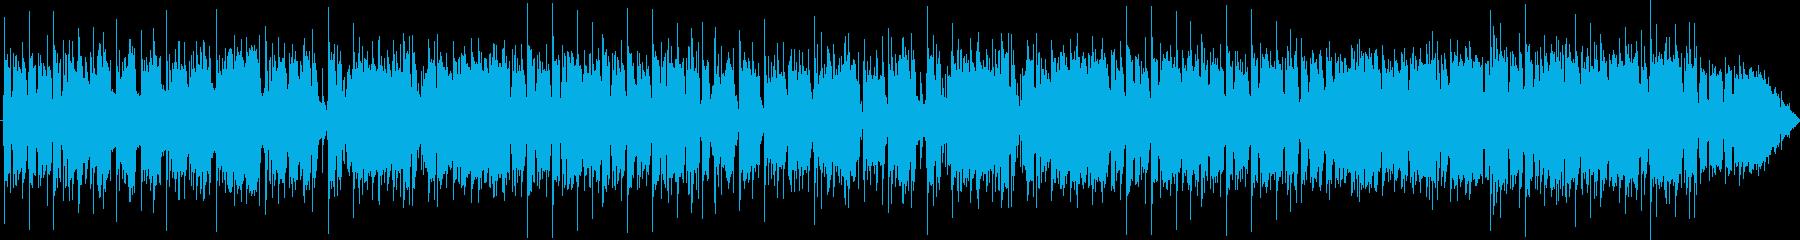 R&B風インストの再生済みの波形